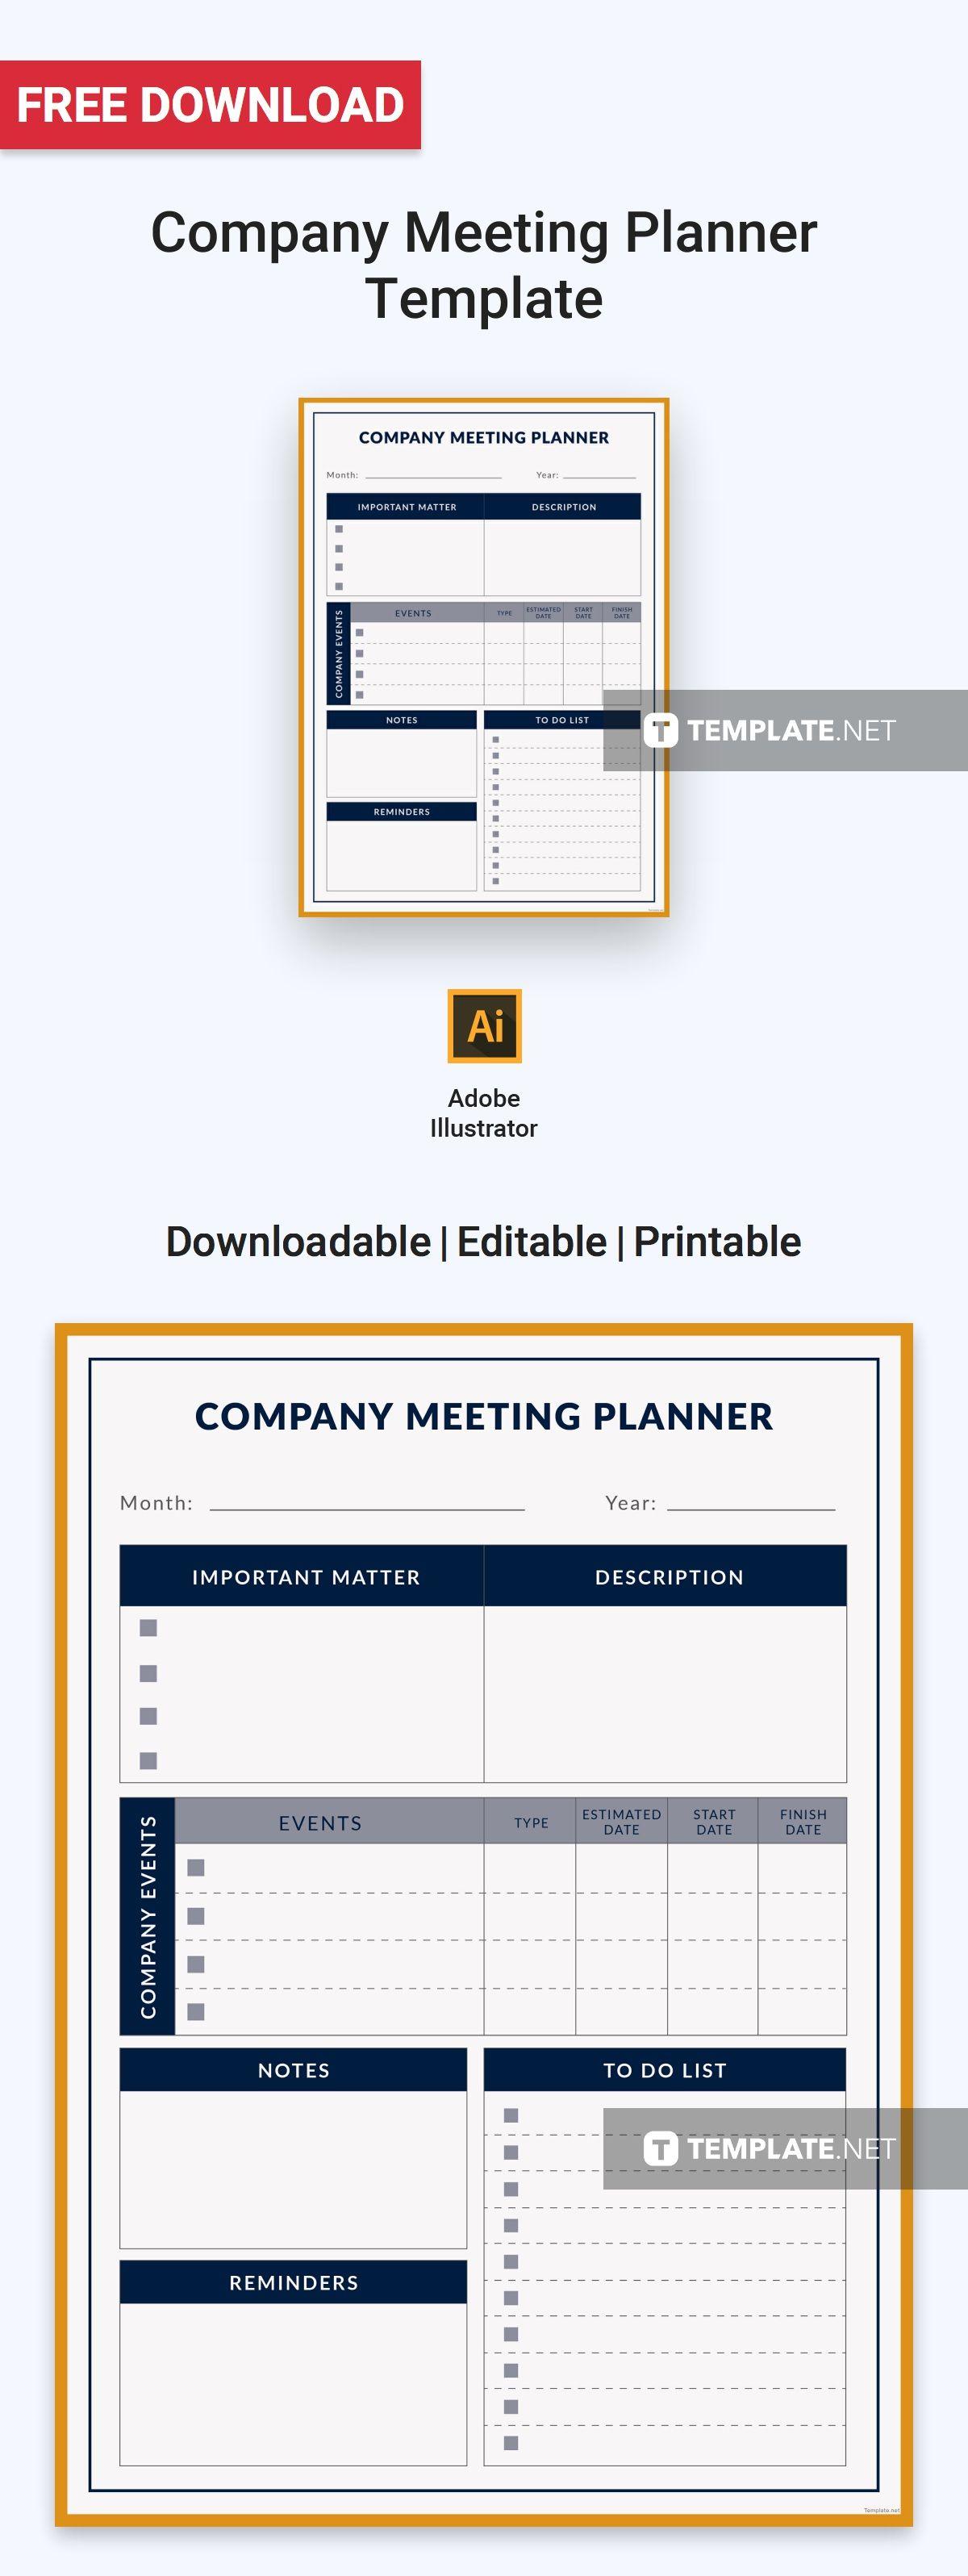 Free Company Meeting Planner Meeting planner, Planner